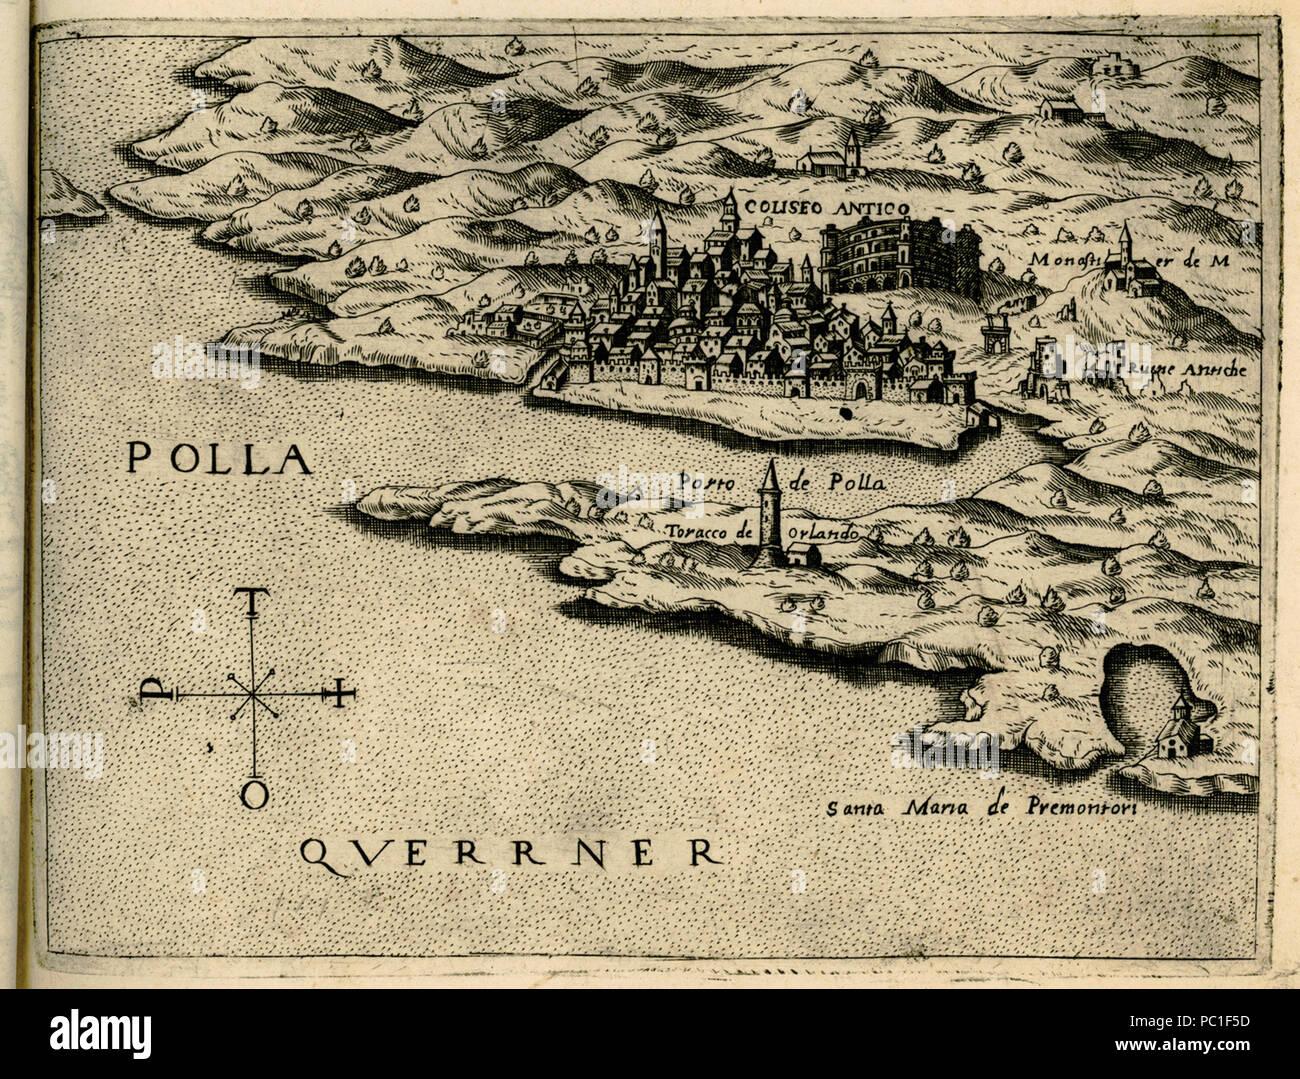 491 Polla - Camocio Giovanni Francesco - 1574